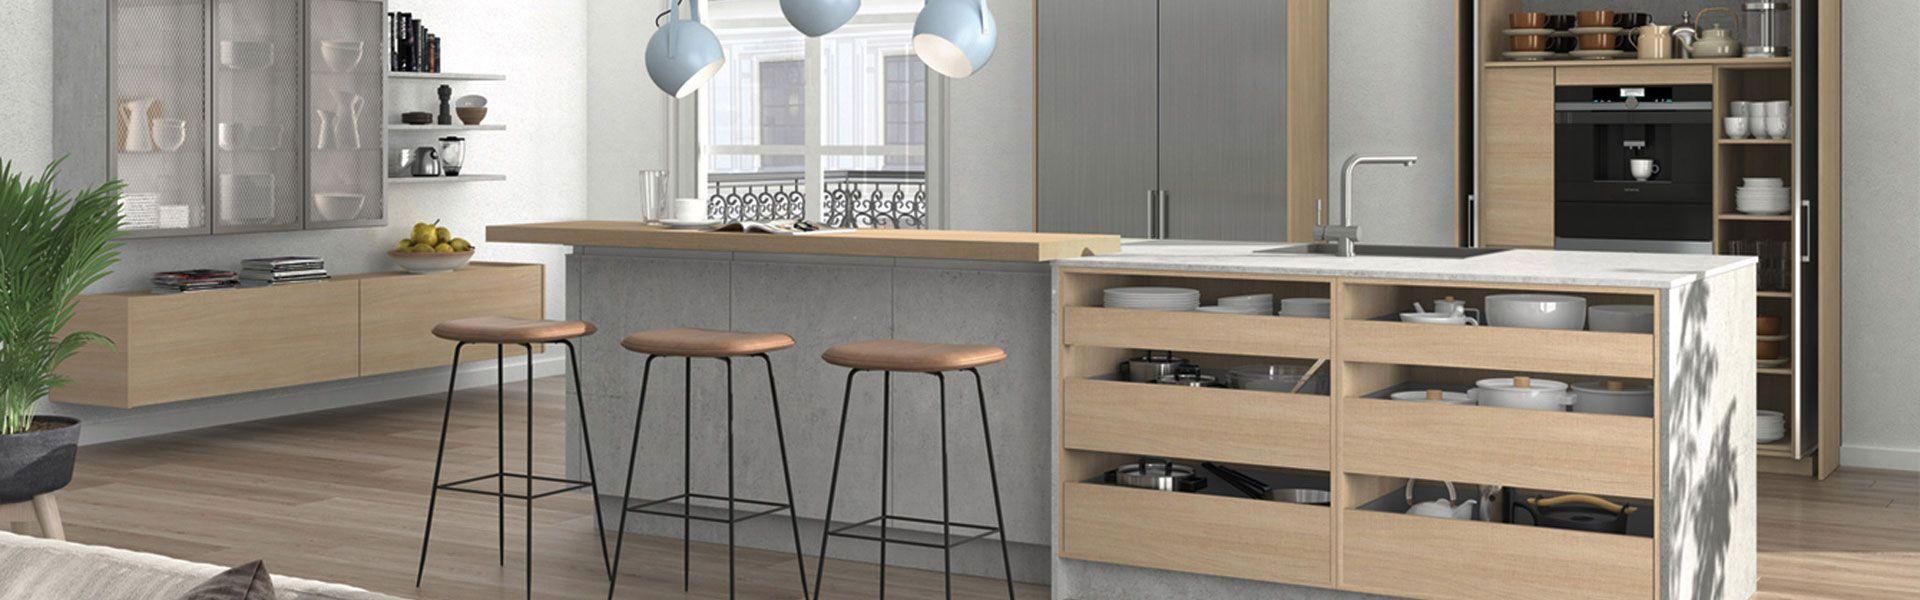 kuche kaufen oldenburg affordable kuche kaufen oldenburg with kuche kaufen oldenburg with kuche. Black Bedroom Furniture Sets. Home Design Ideas